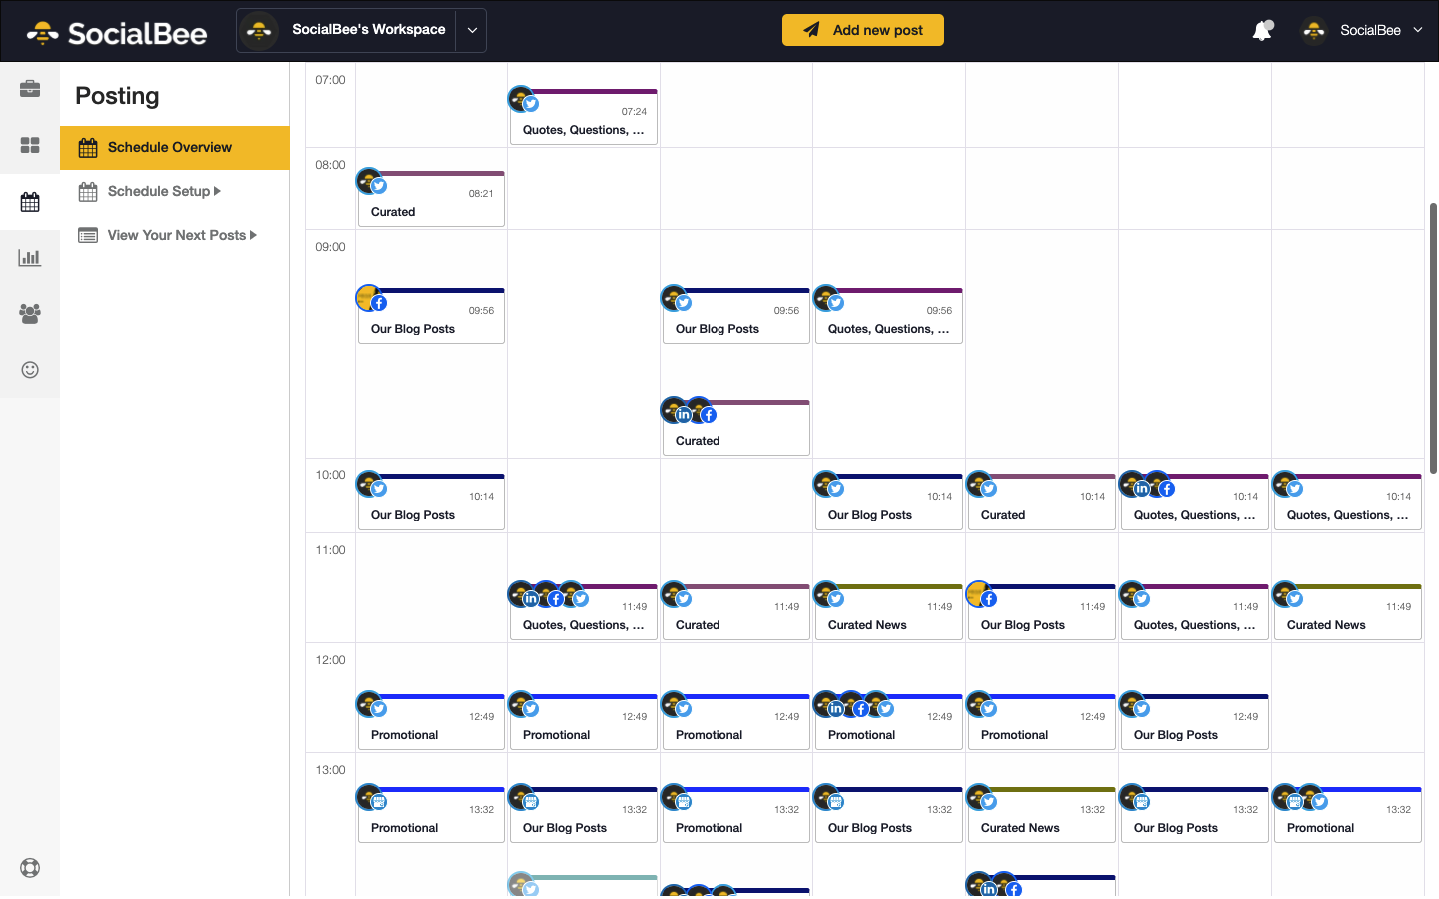 calendrier programmation SocialBee